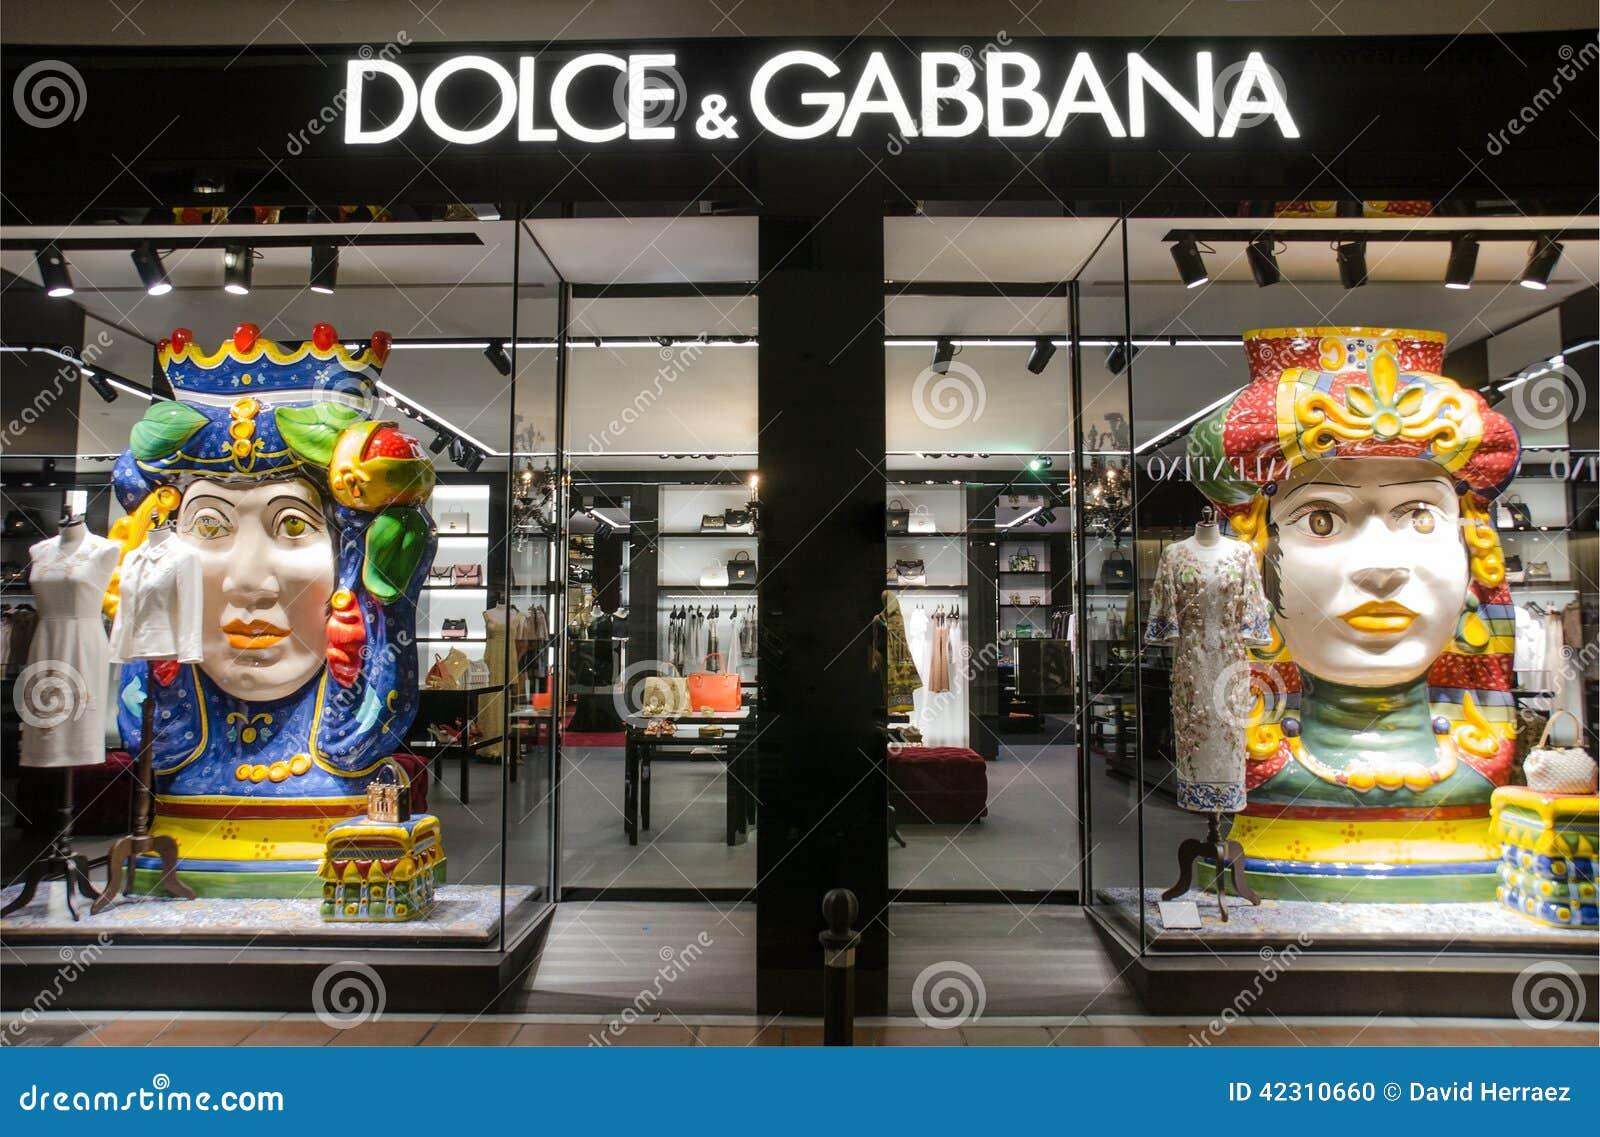 aa42cb1aece56 Magasin De Dolce Et De Gabbana Dans Puerto Banus, Marbella, Espagne ...